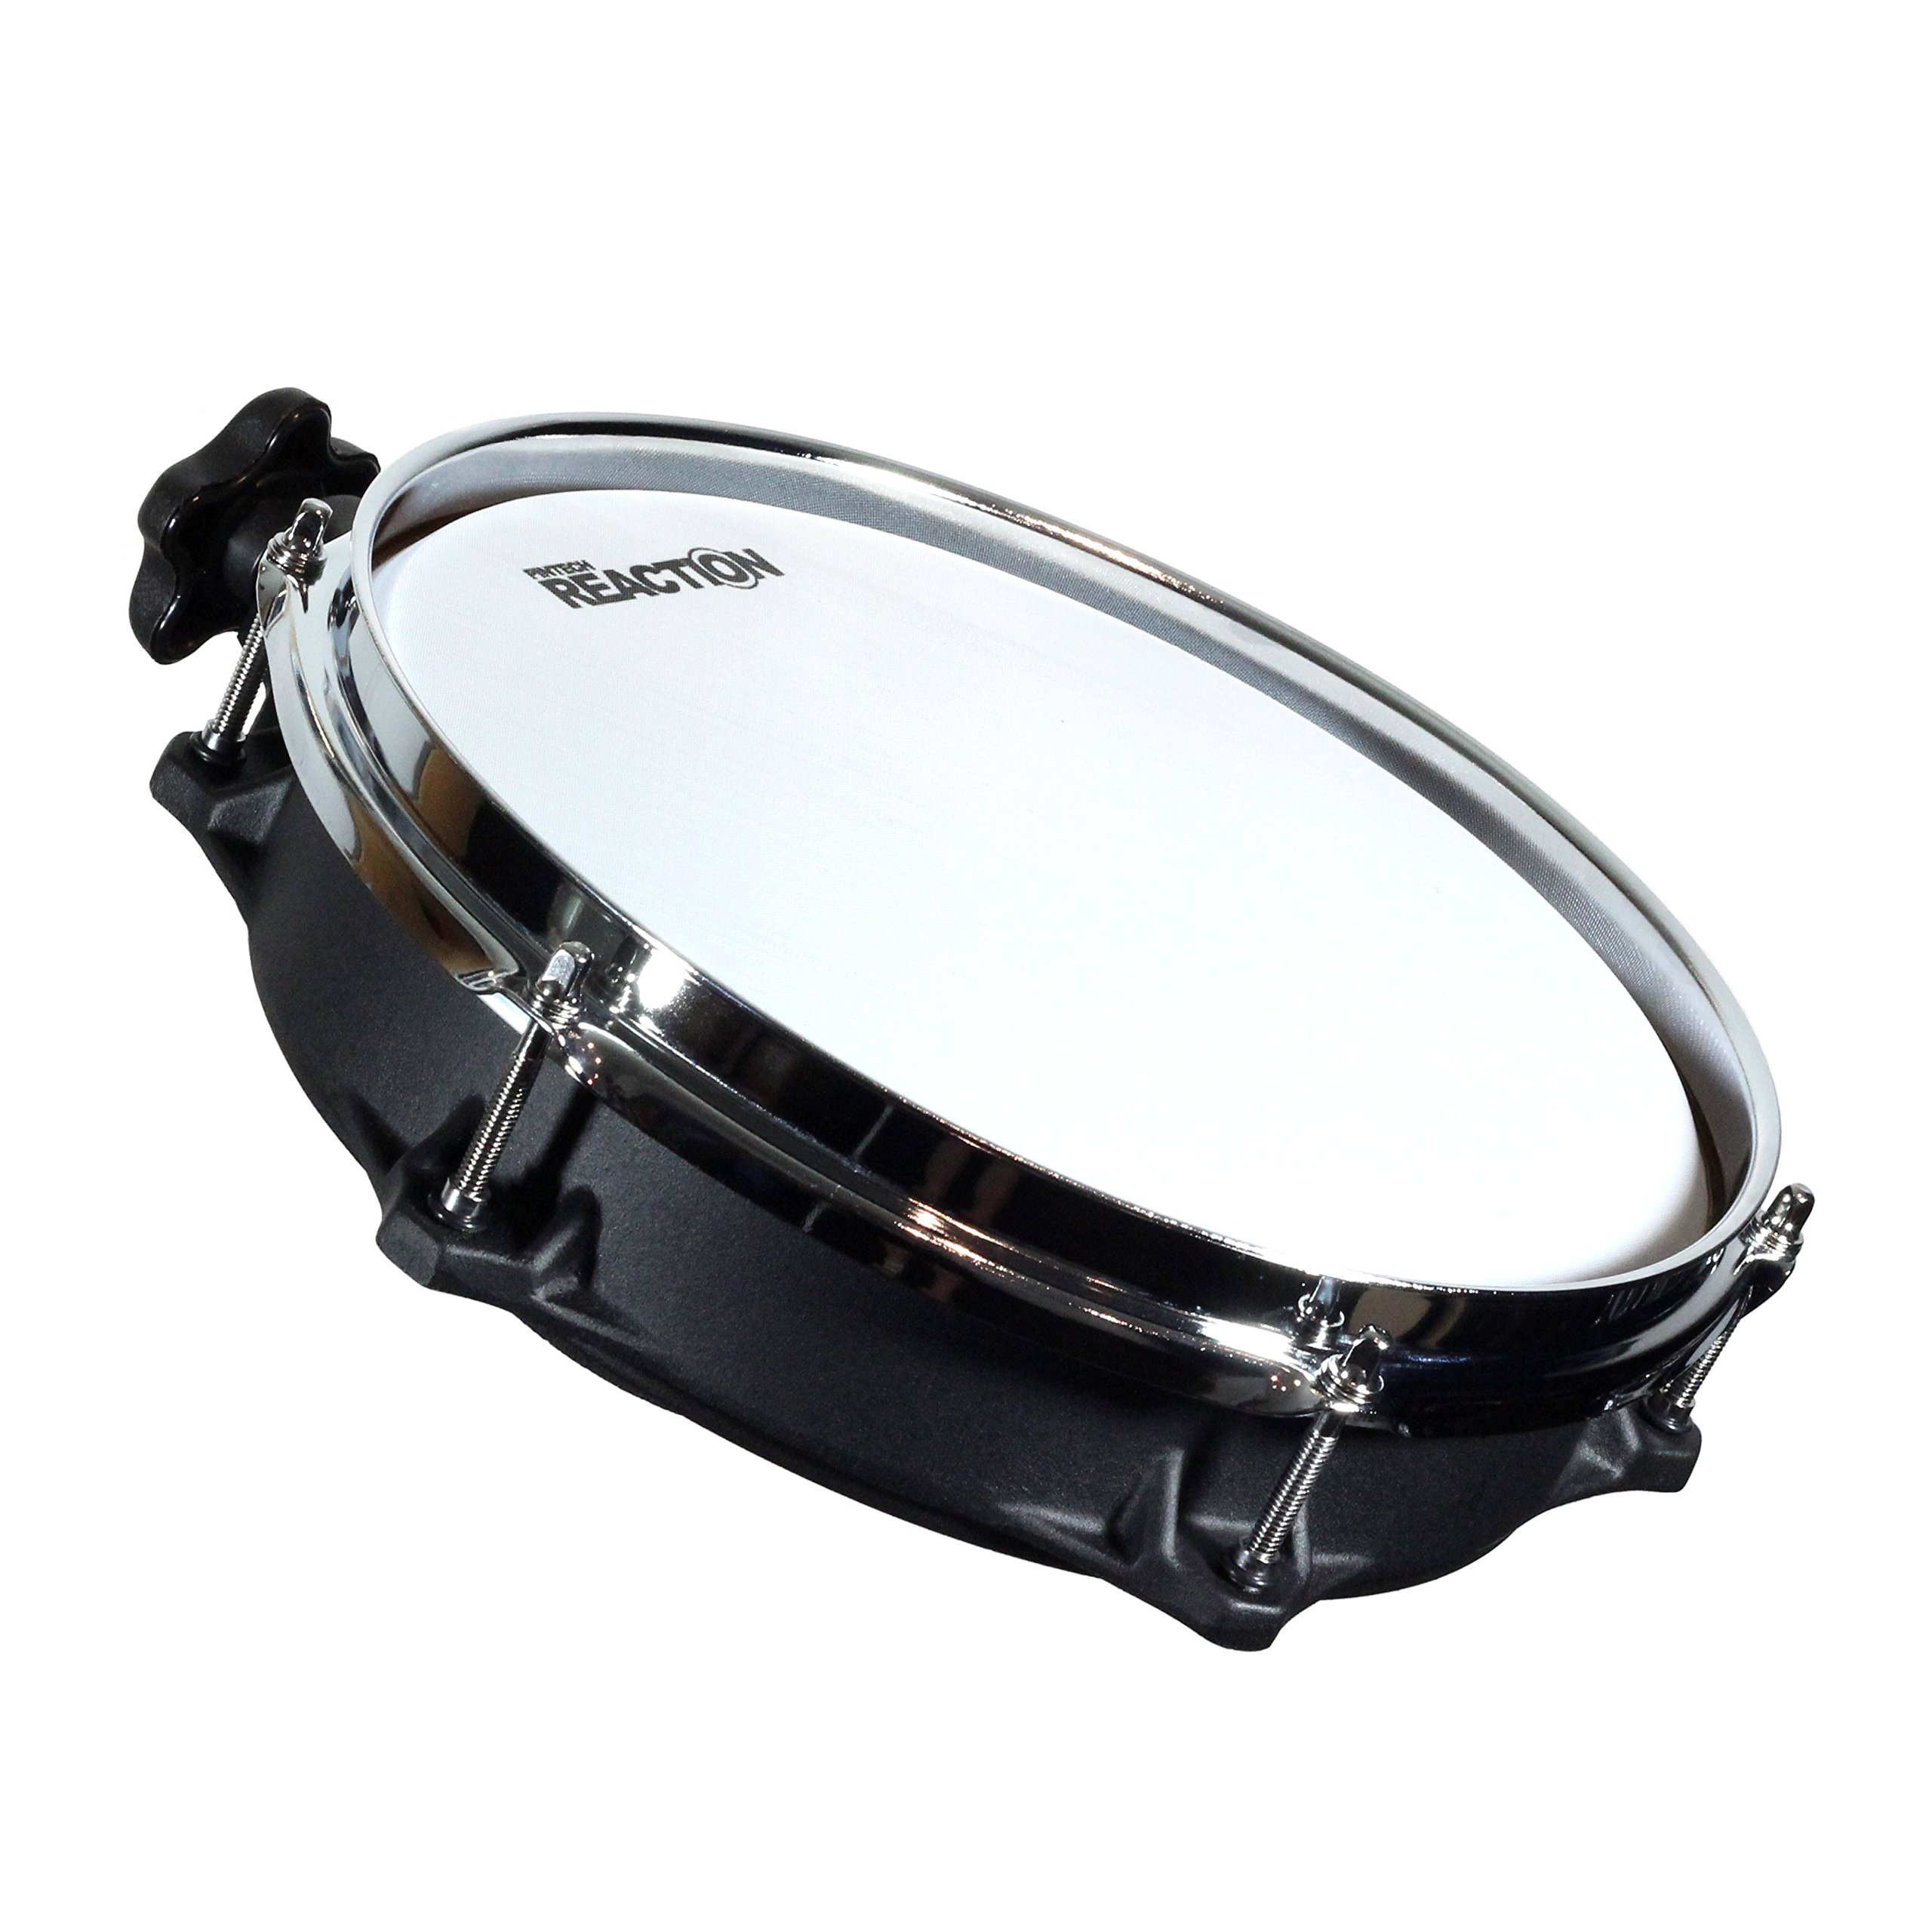 Pintech Percussion CC102B ConcertCast Mesh Drum Pad 10'' Dual Zone